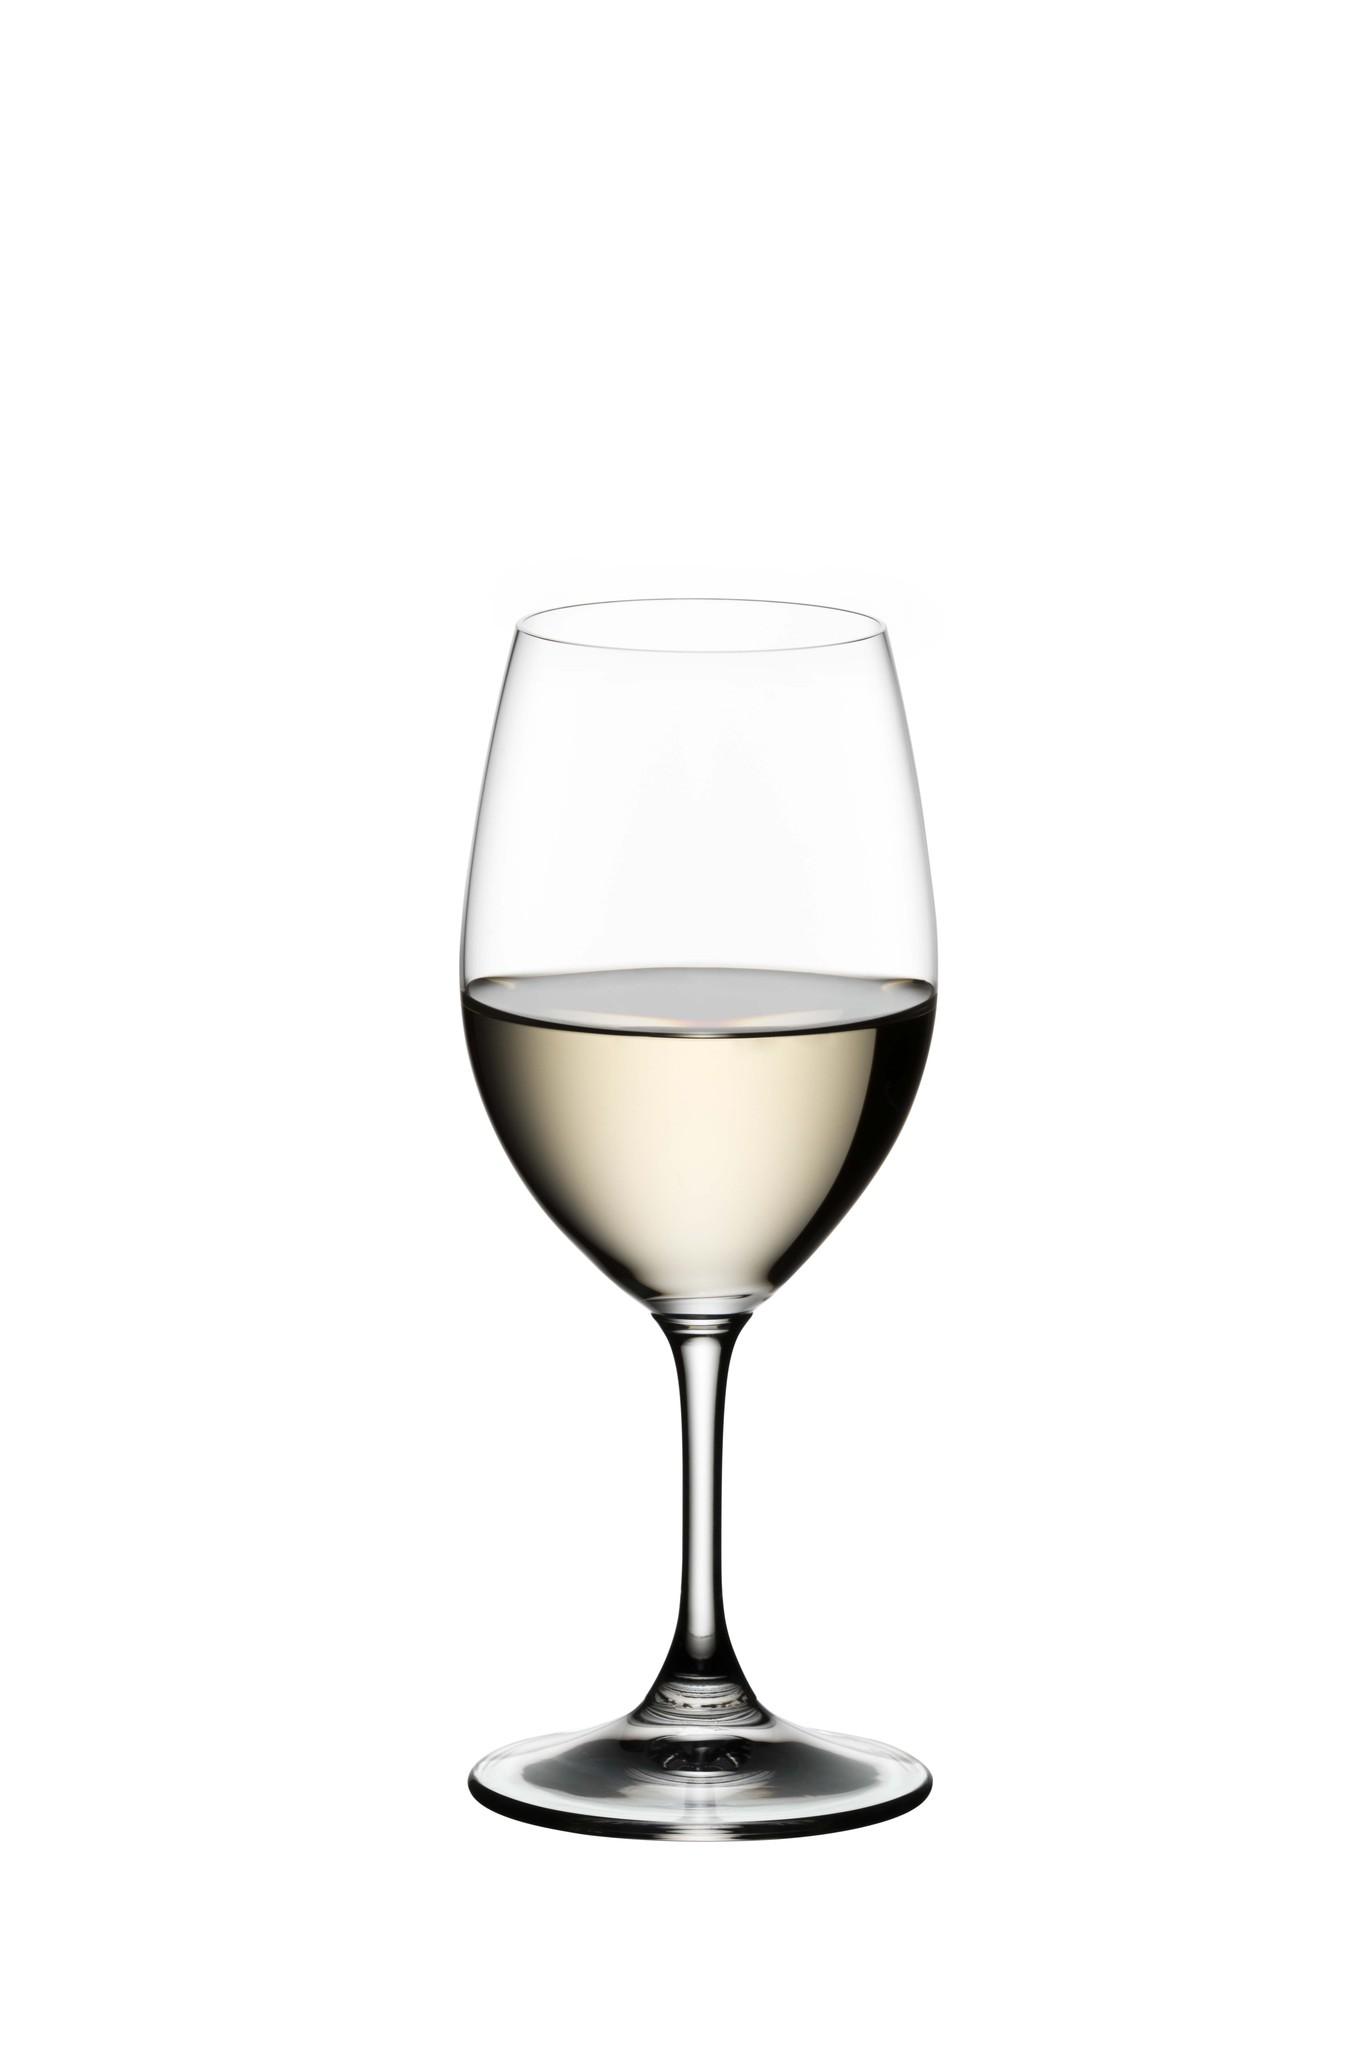 Бокалы Набор бокалов для белого вина 2шт 280мл Riedel Ouverture White Wine nabor-bokalov-dlya-belogo-vina-2sht-280ml-riedel-ouverture-white-wine-avstriya.jpg